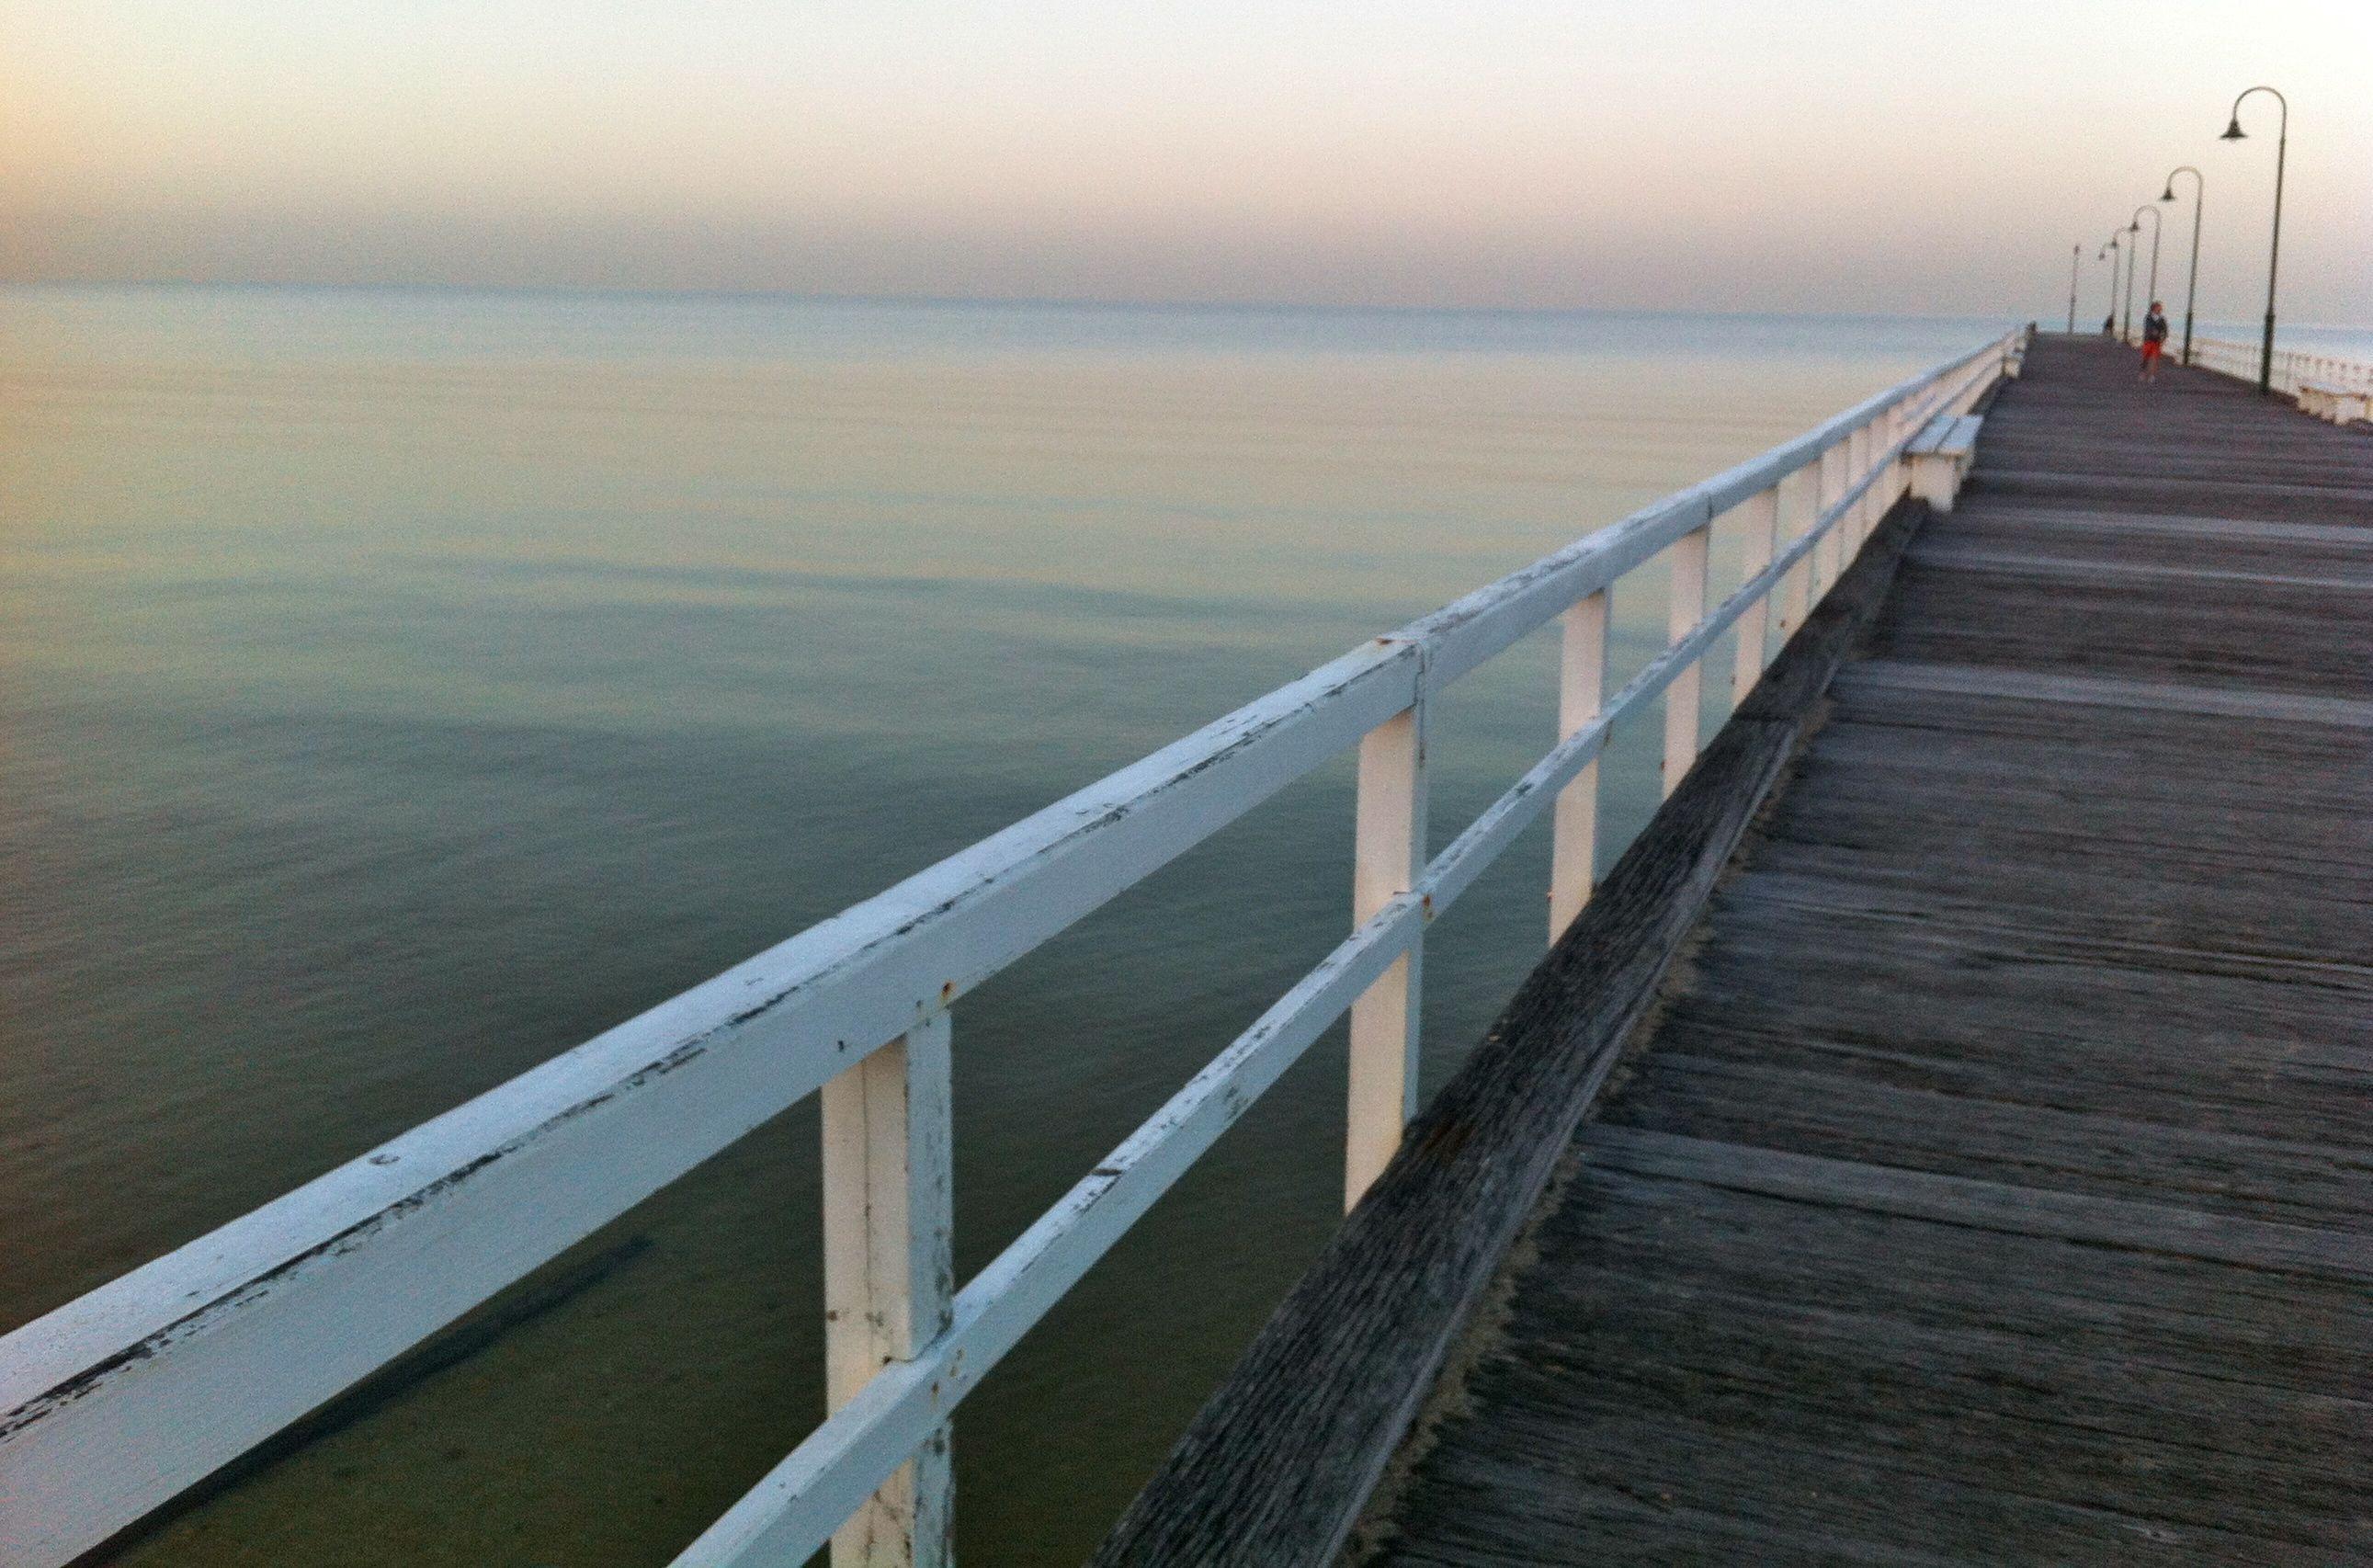 Pier at St Kilda beach, Melbourne